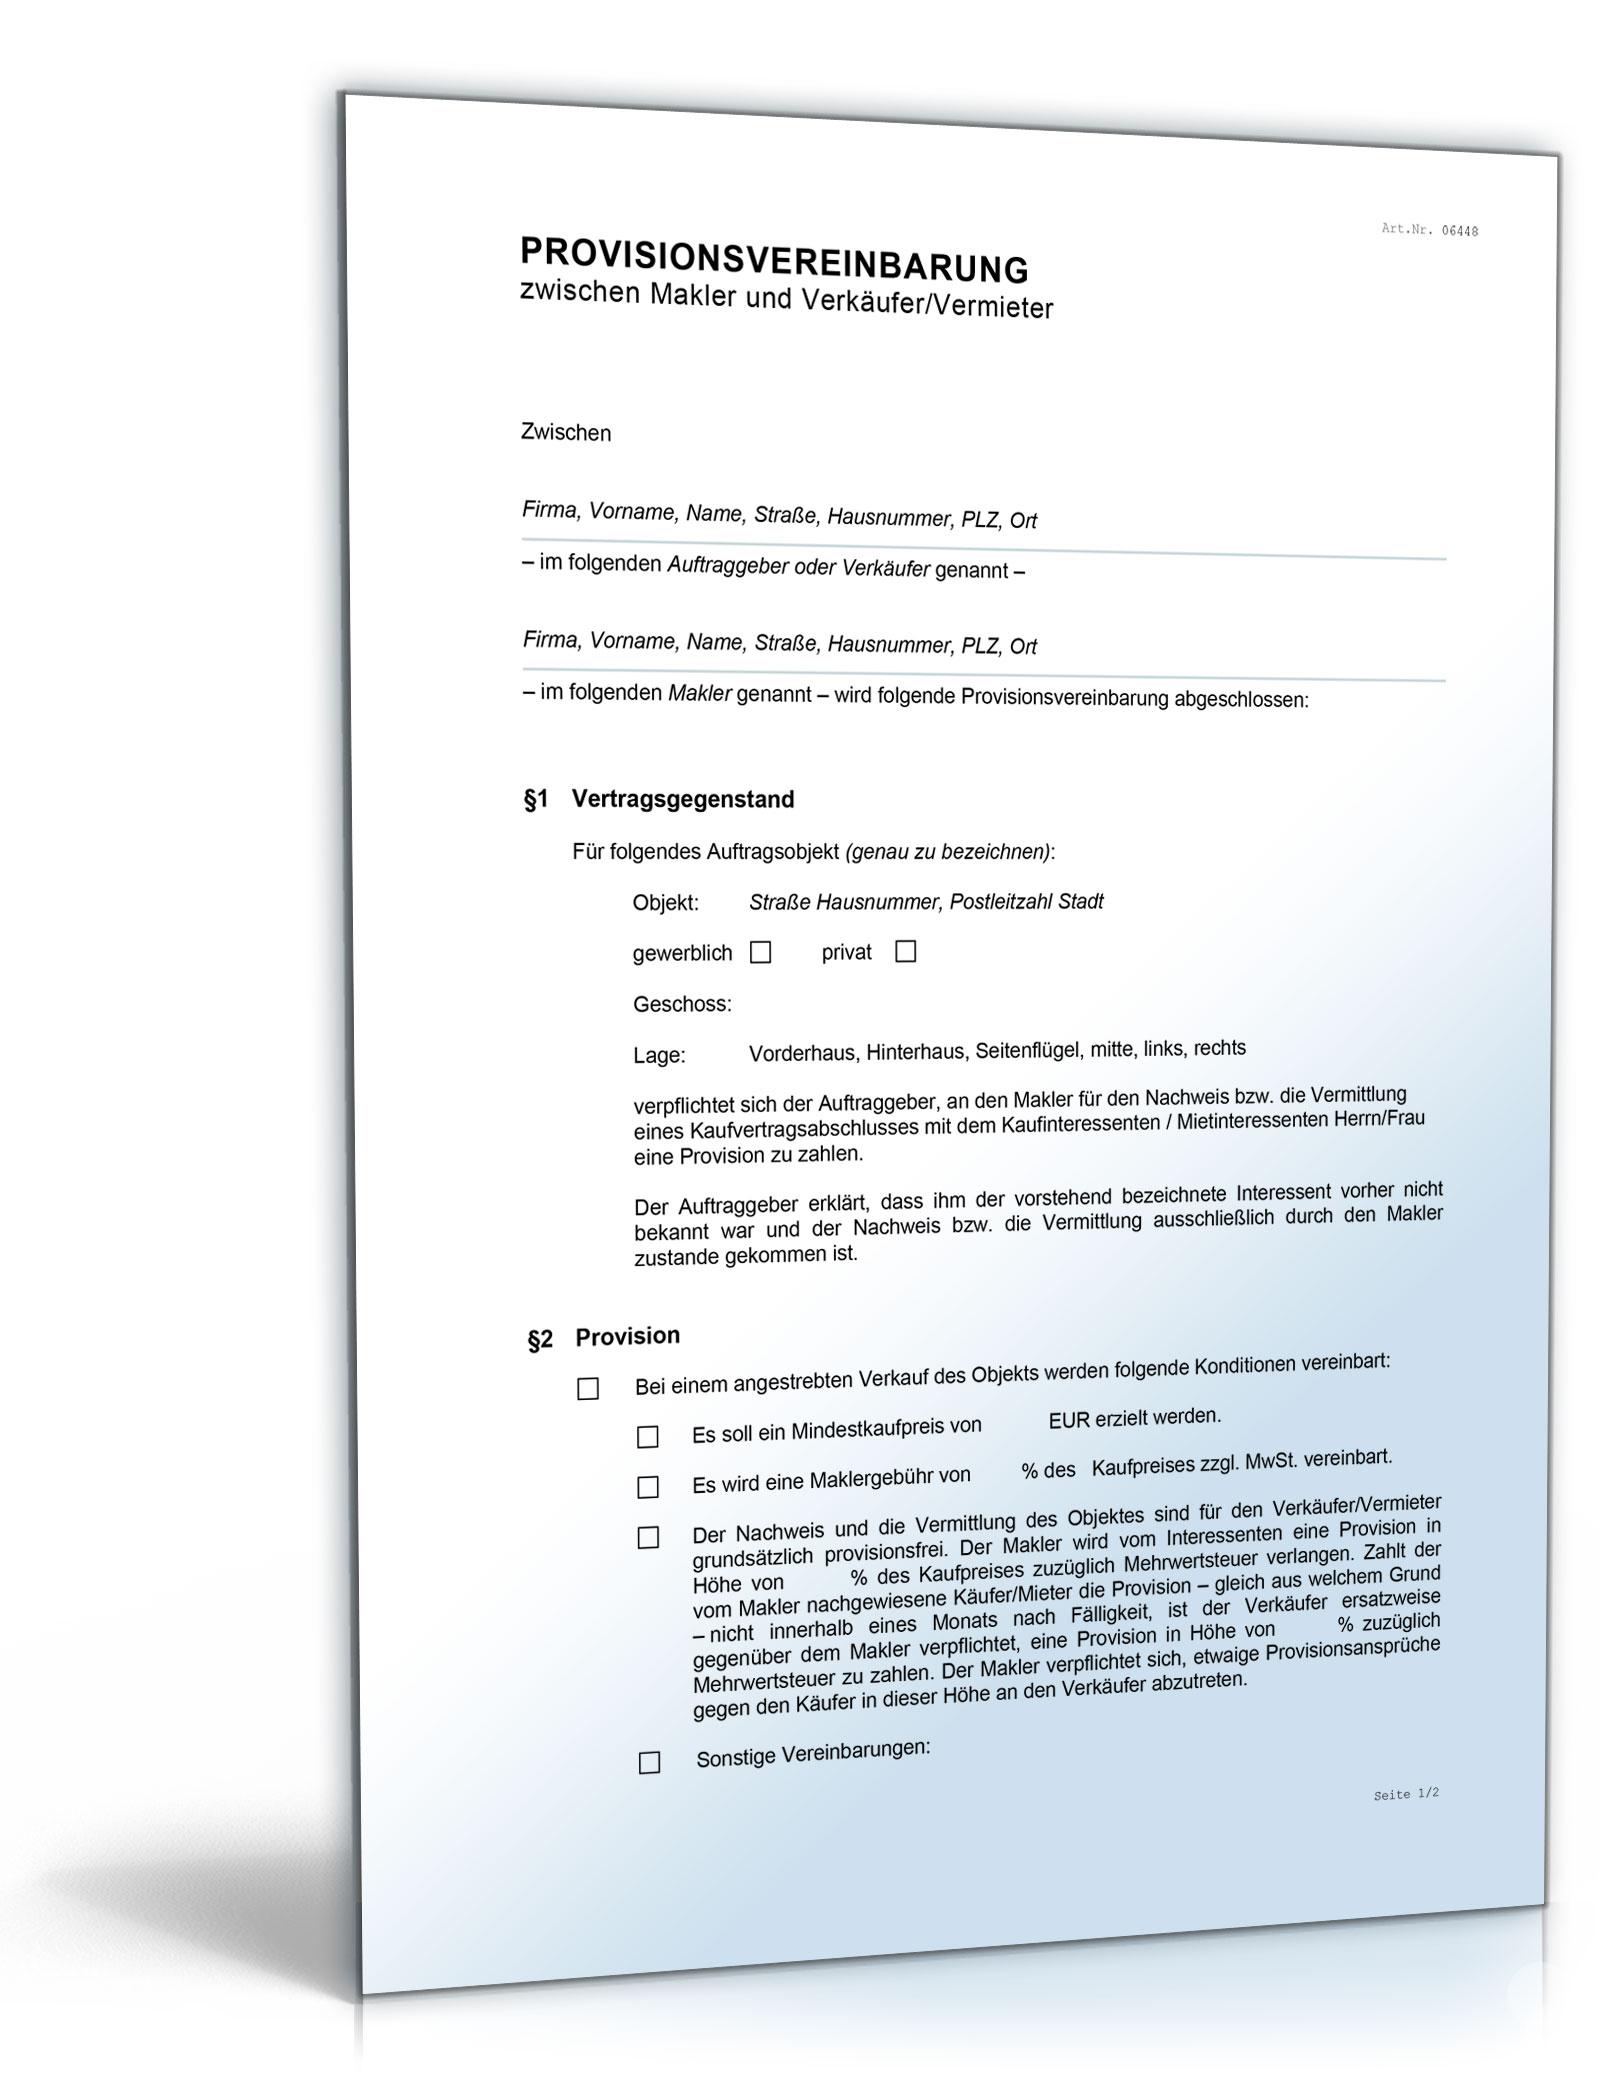 Provisionsvereinbarung Makler Vermieter Word Dokument Amazonde